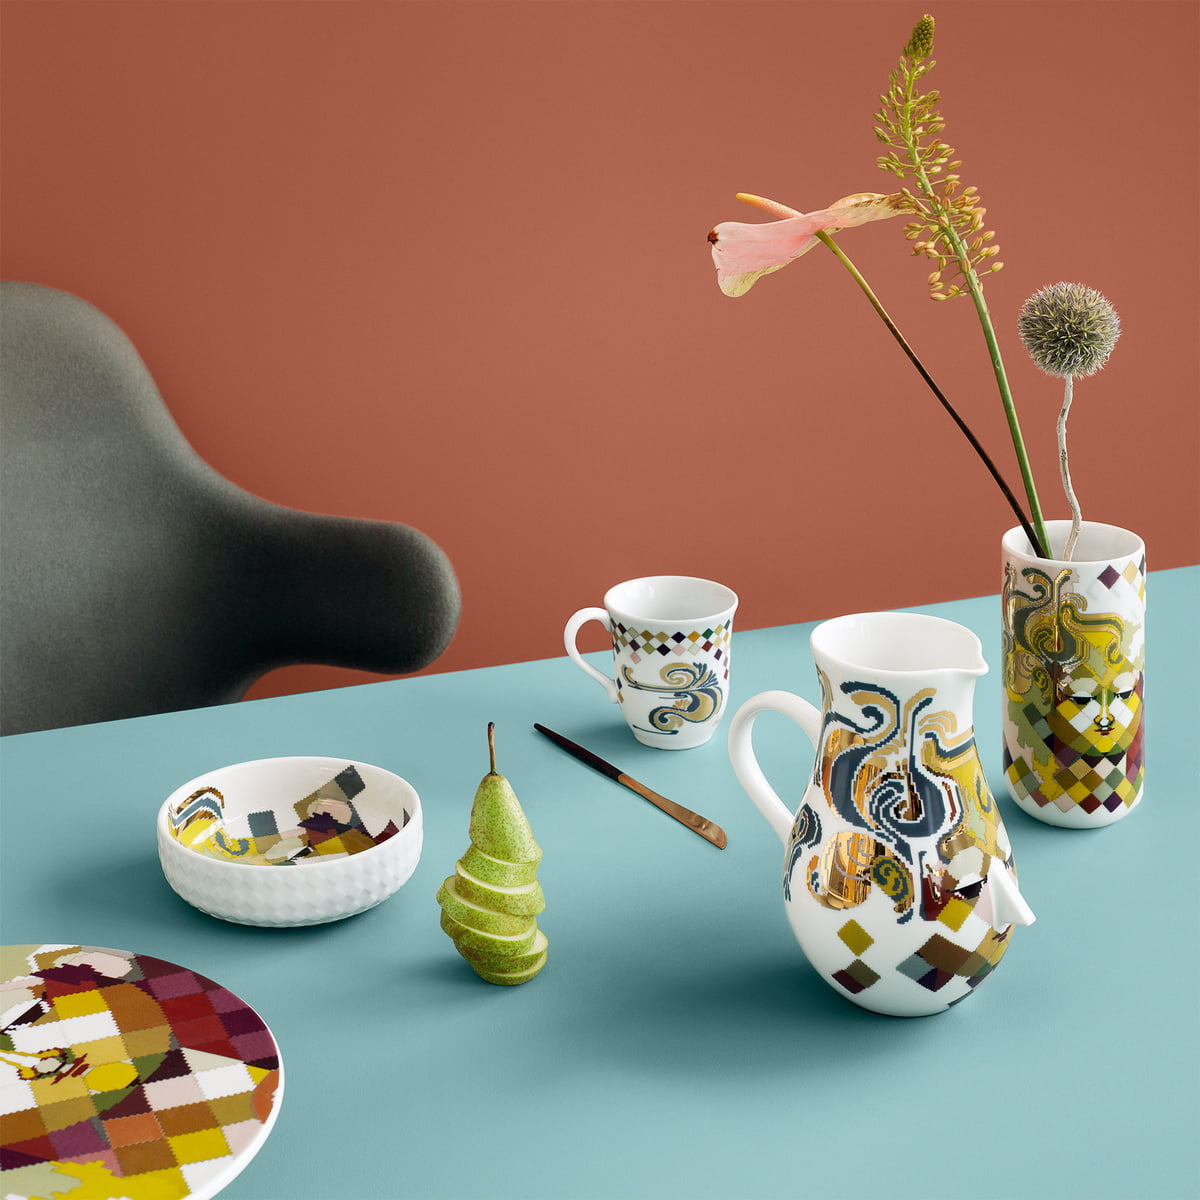 Tapestry mug by bj rn wiinblad connox for Connox com